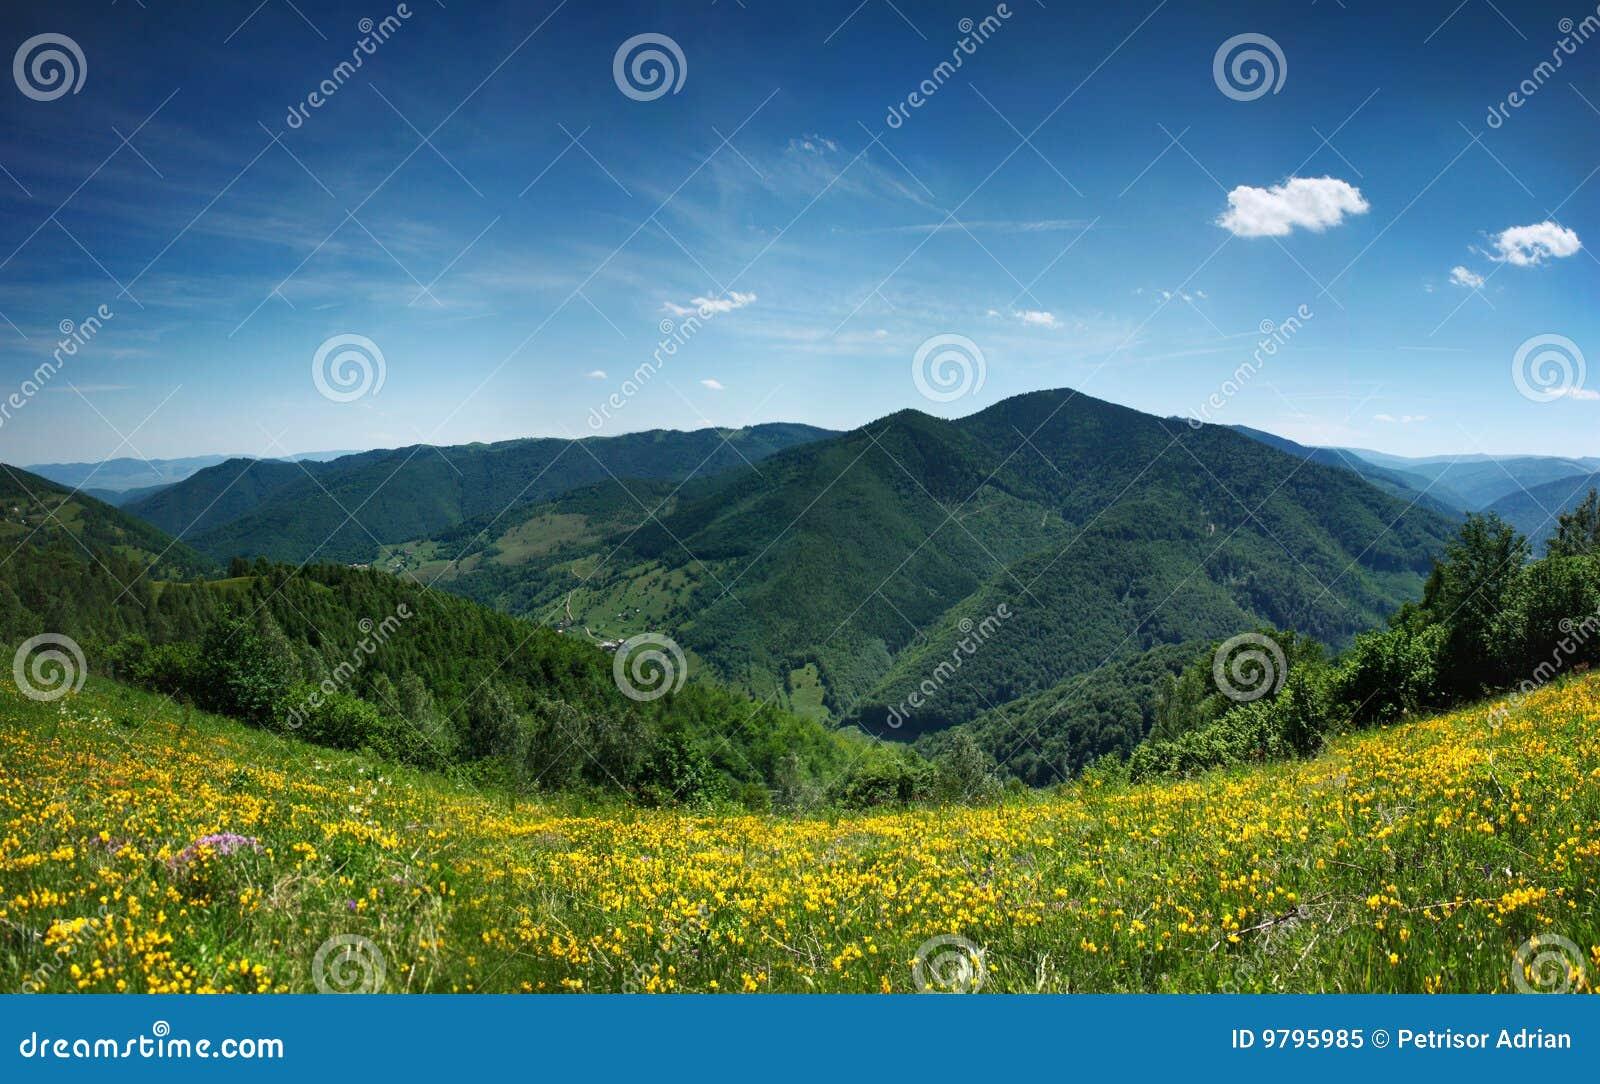 Mountain landscape panorama, beauty of nature